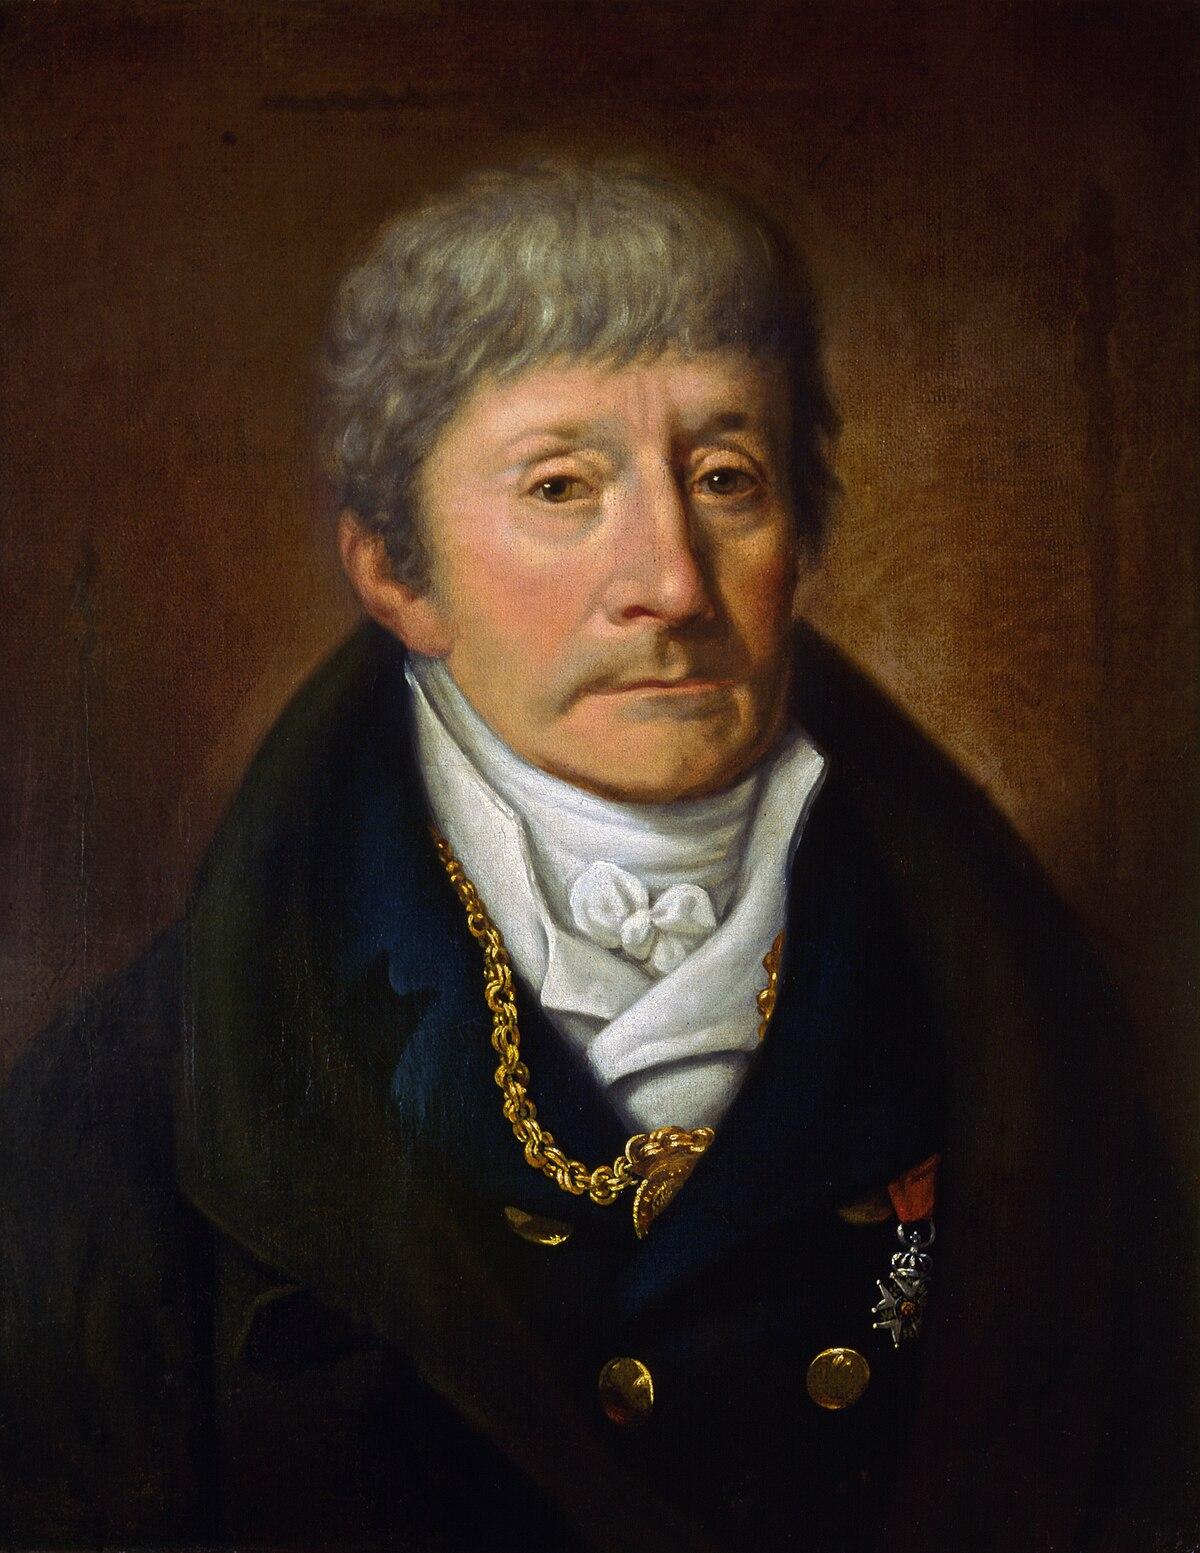 Antonio Salieri – Wikipedia